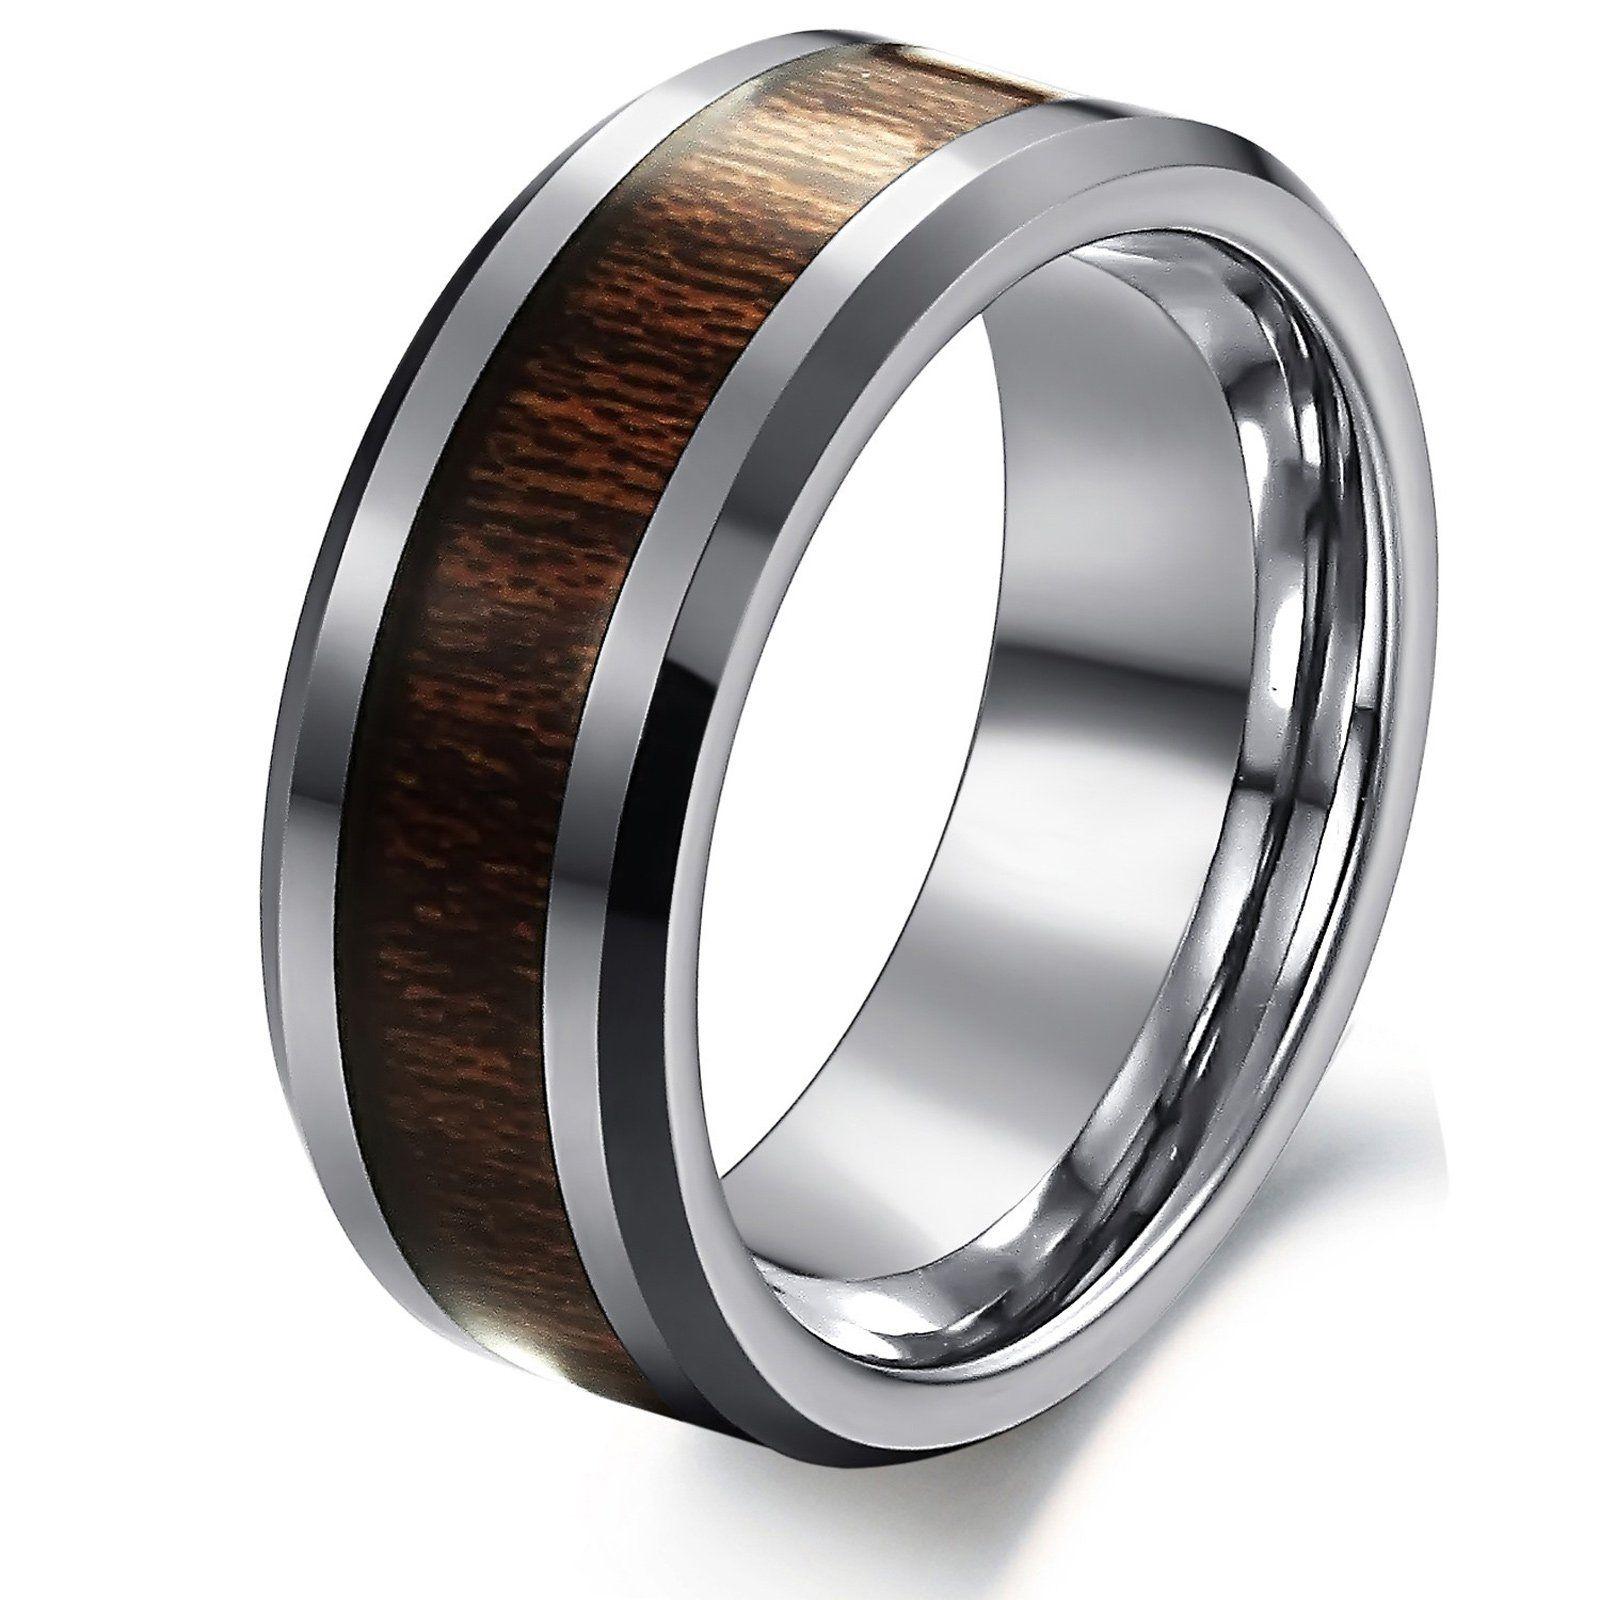 Opk Jewelry Fashion Men s Ring Inlaid Carbon Fiber Pure Tungsten